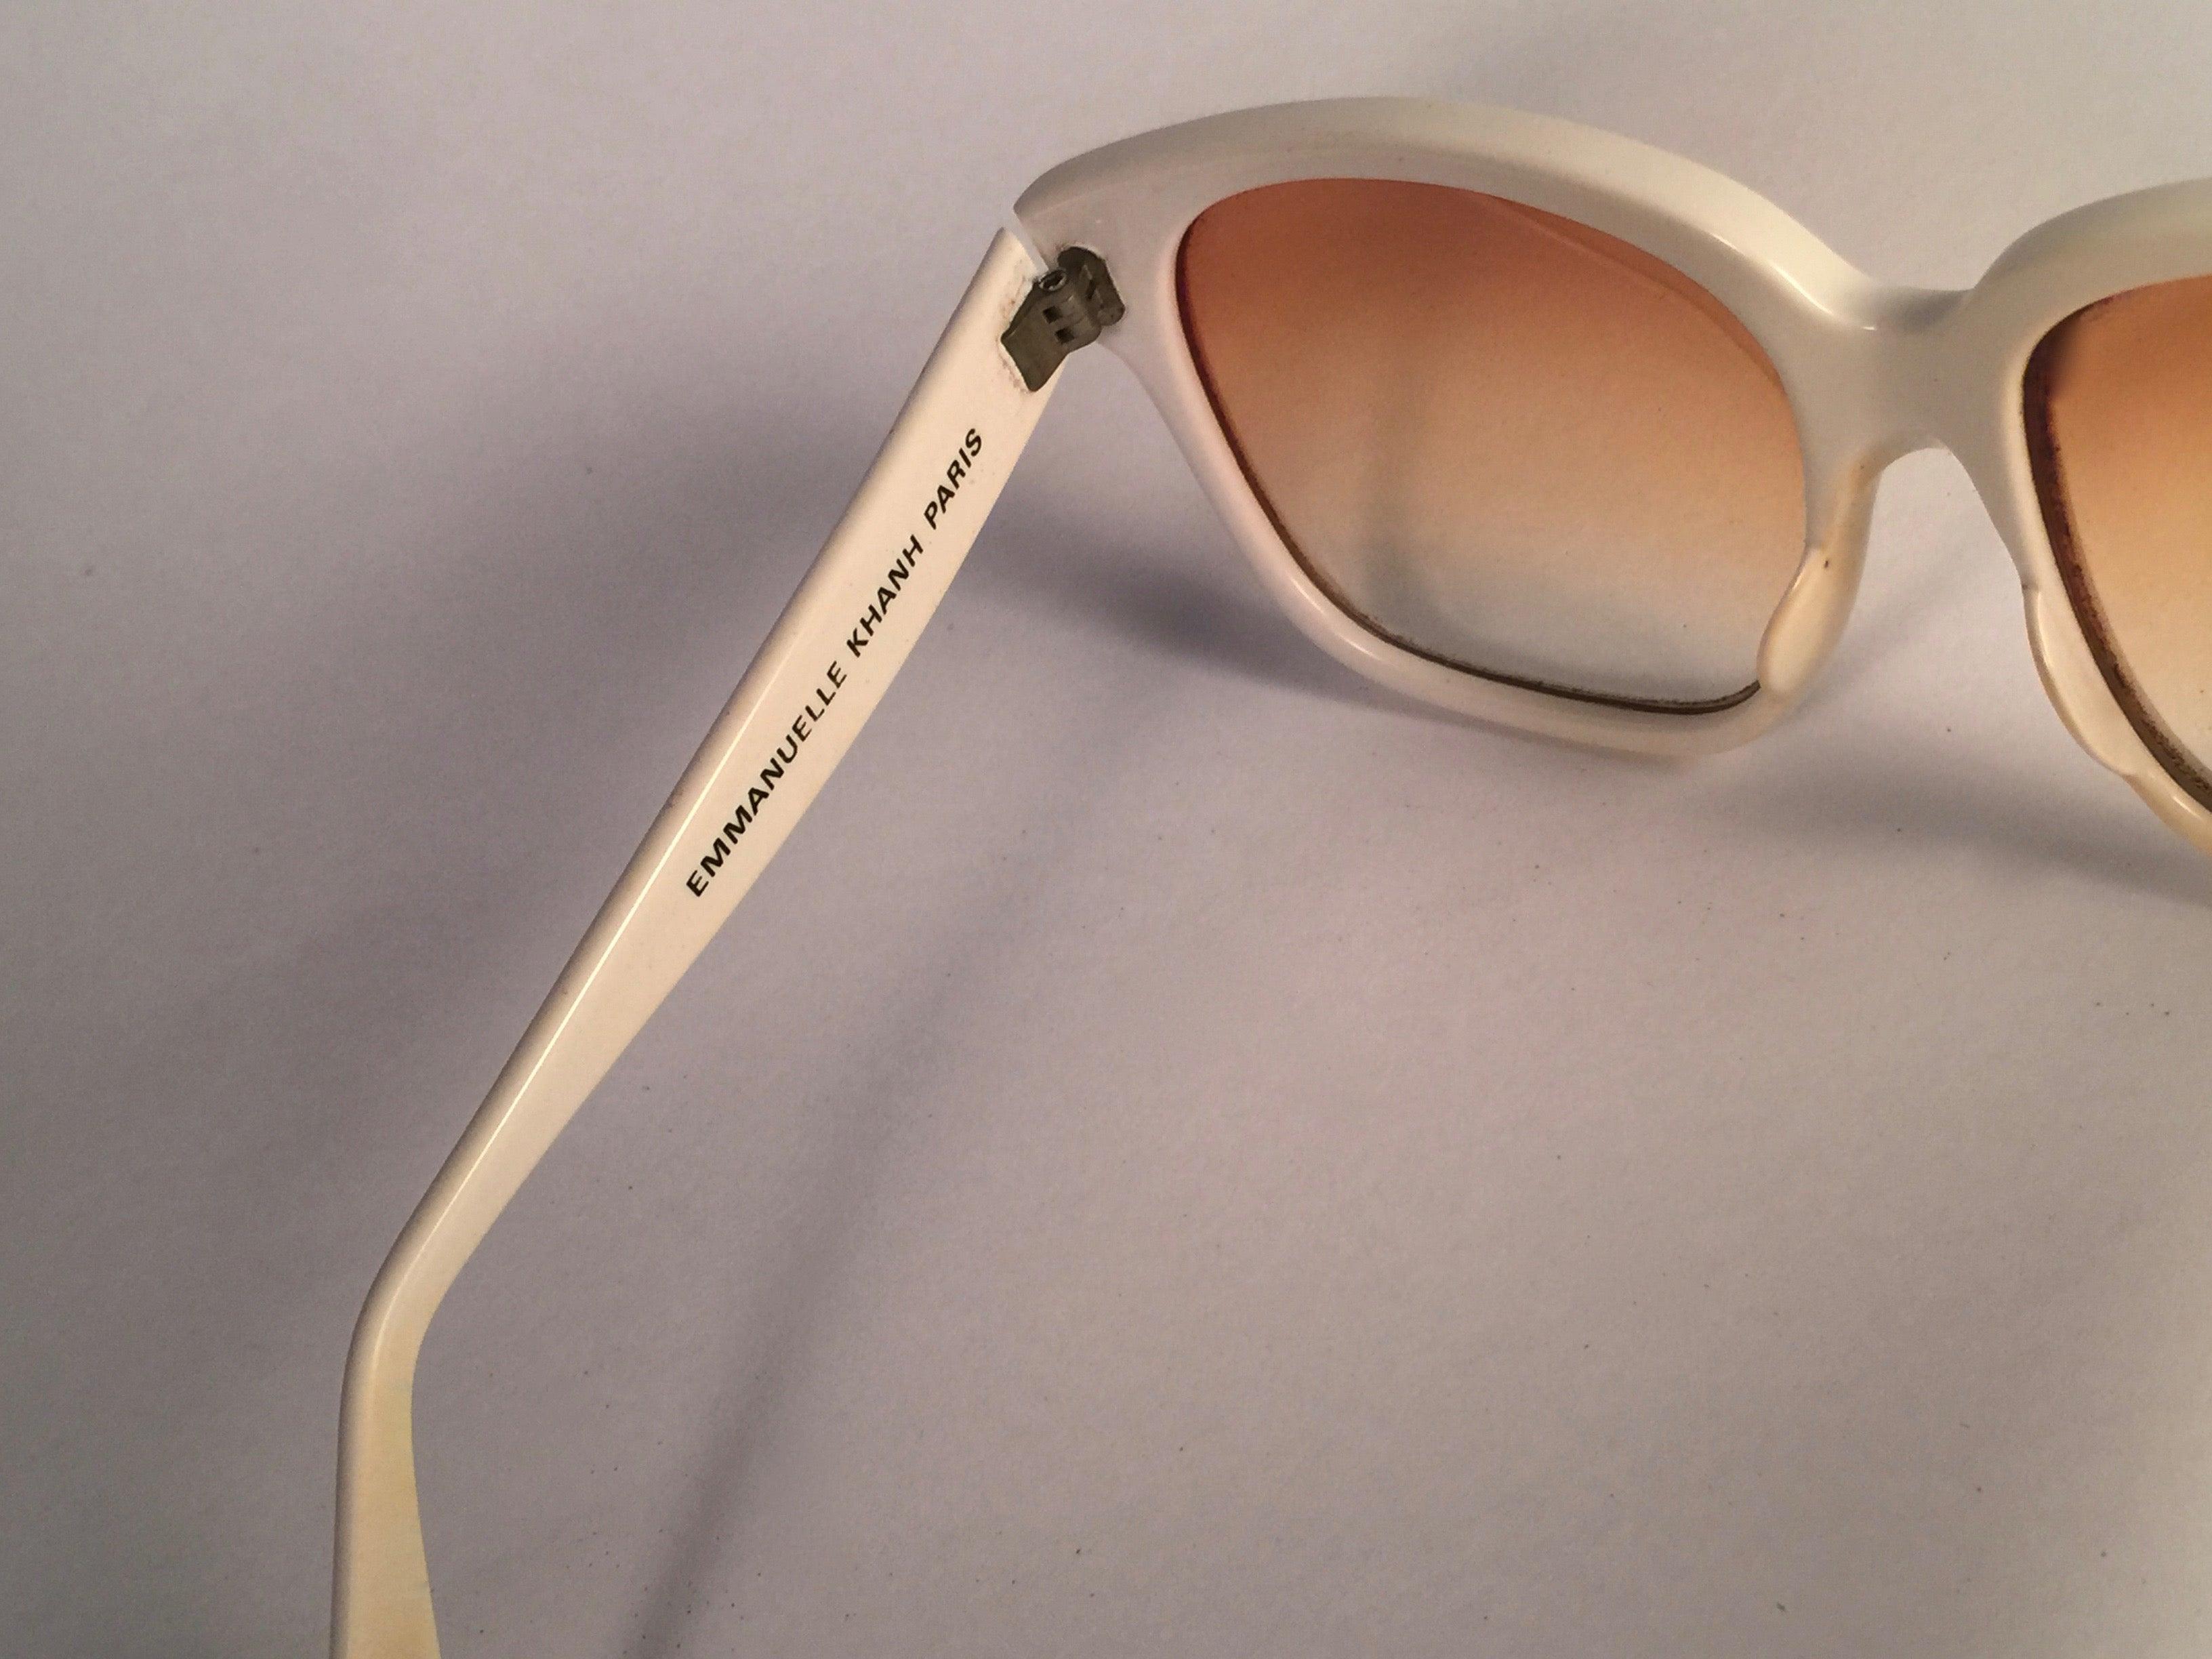 cb3b77a294e New vintage emanuelle kahn paris white gold accents sunglasses france for  sale at stdibs jpg 3264x2448